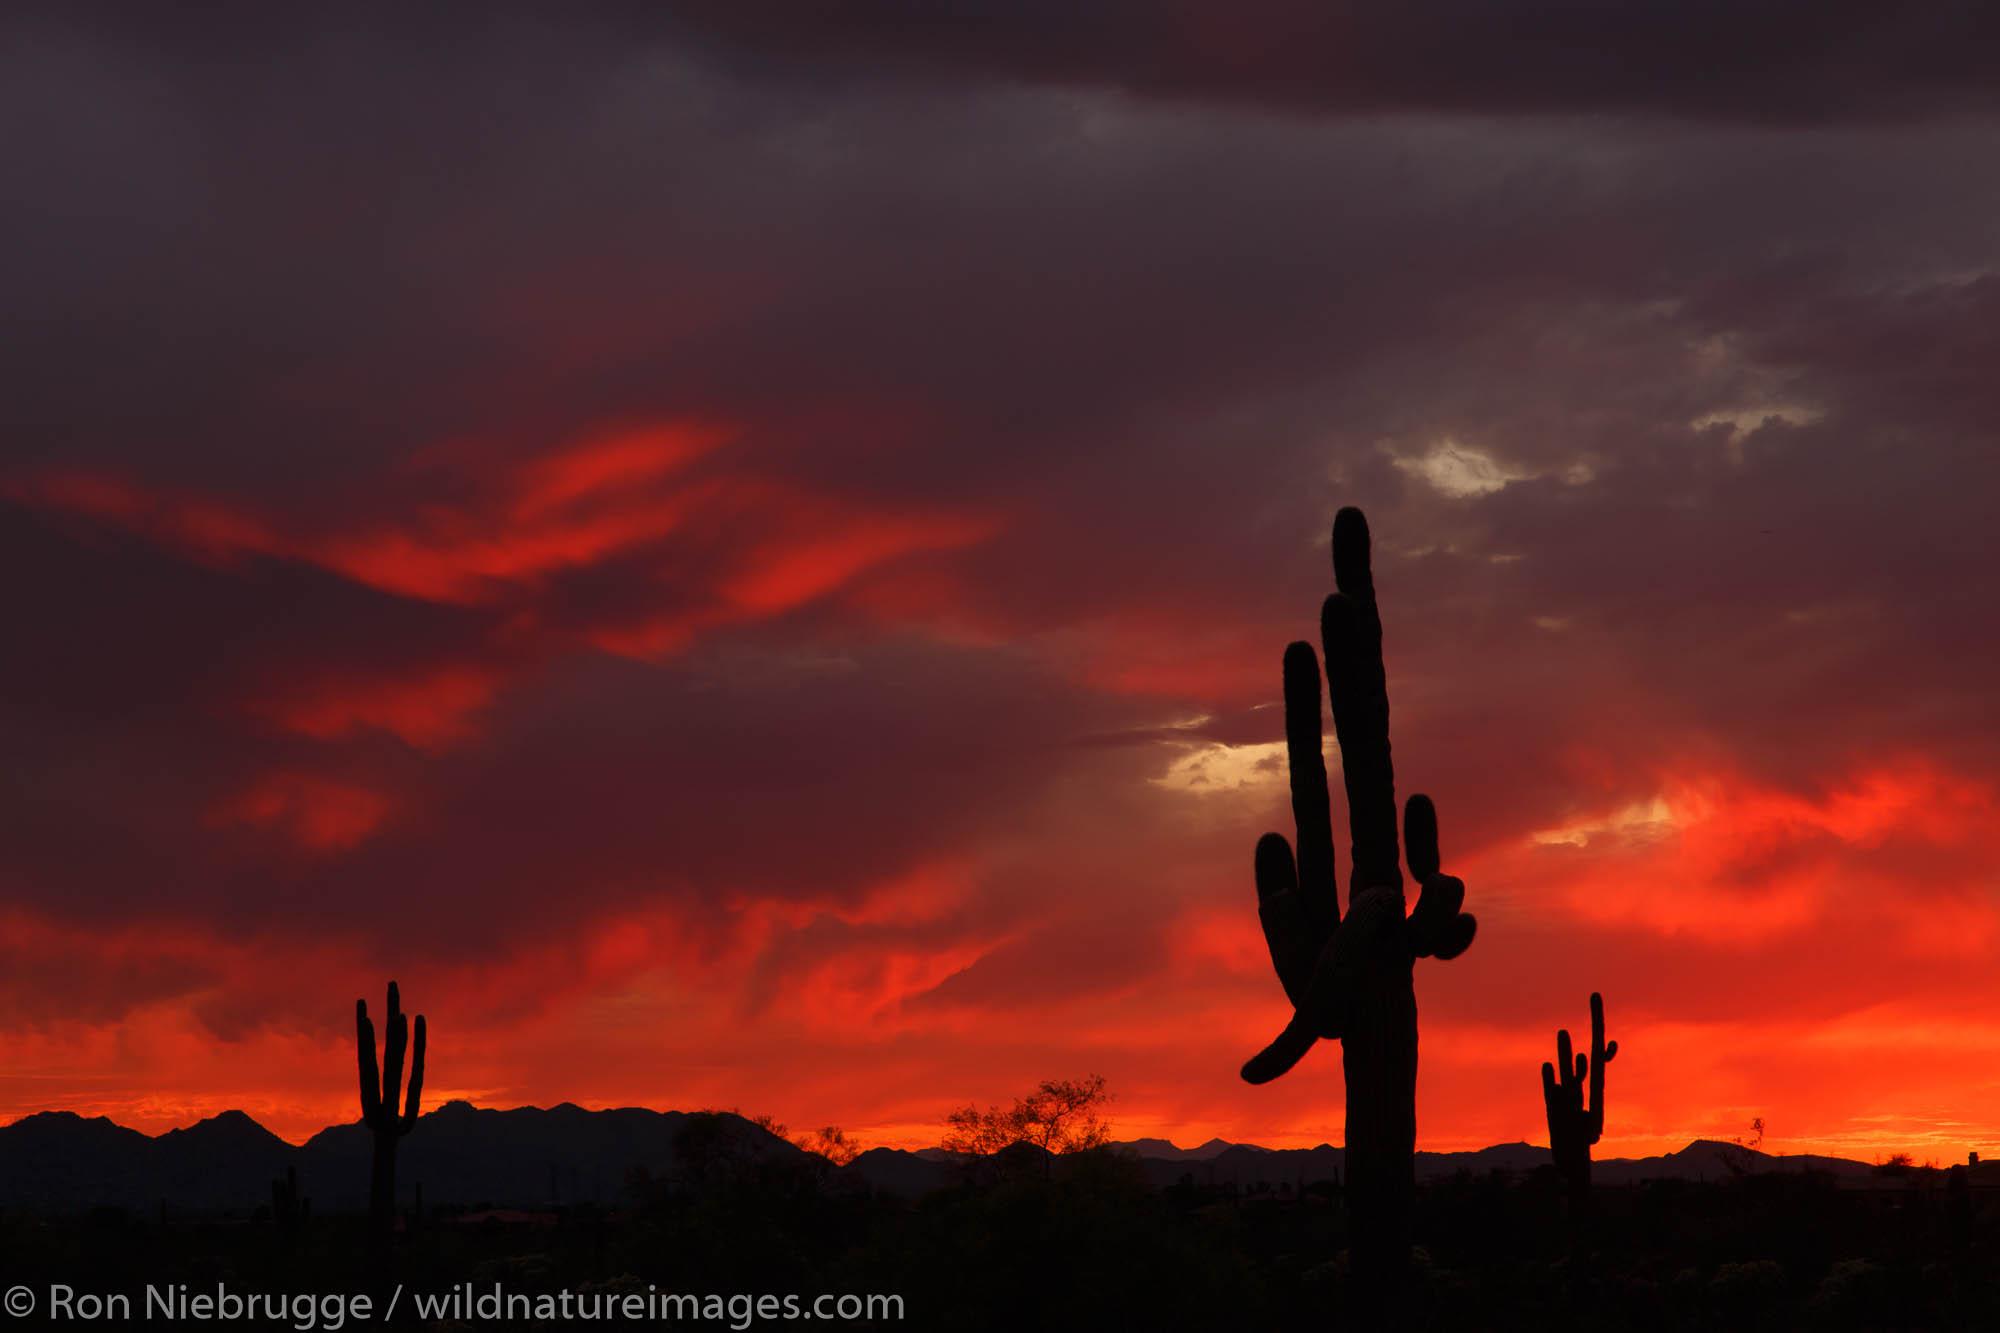 Saguaro cactus at sunset, Scottsdale, Arizona.